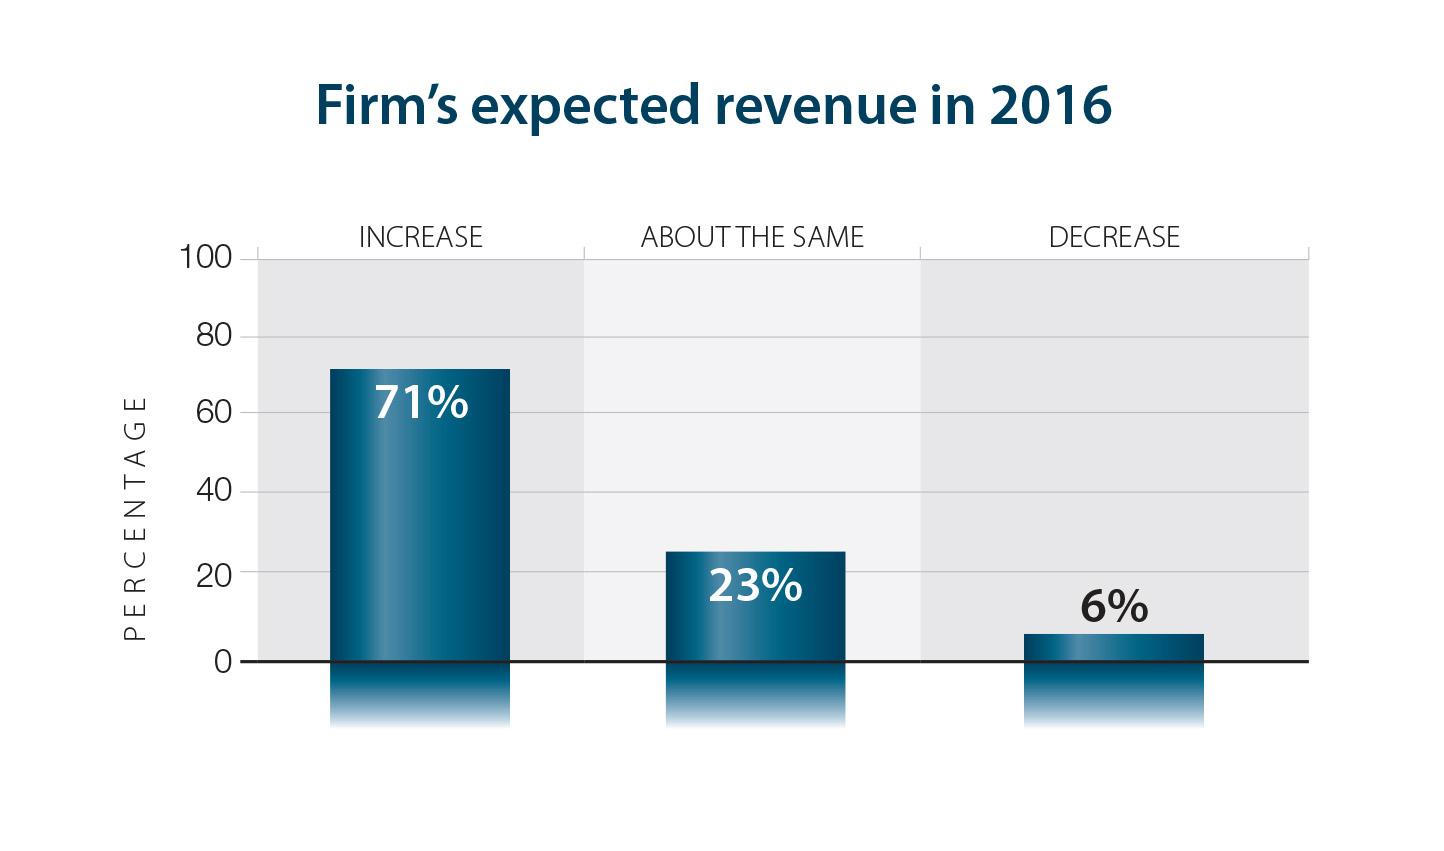 71% of CEOs expect increased revenue in 2016